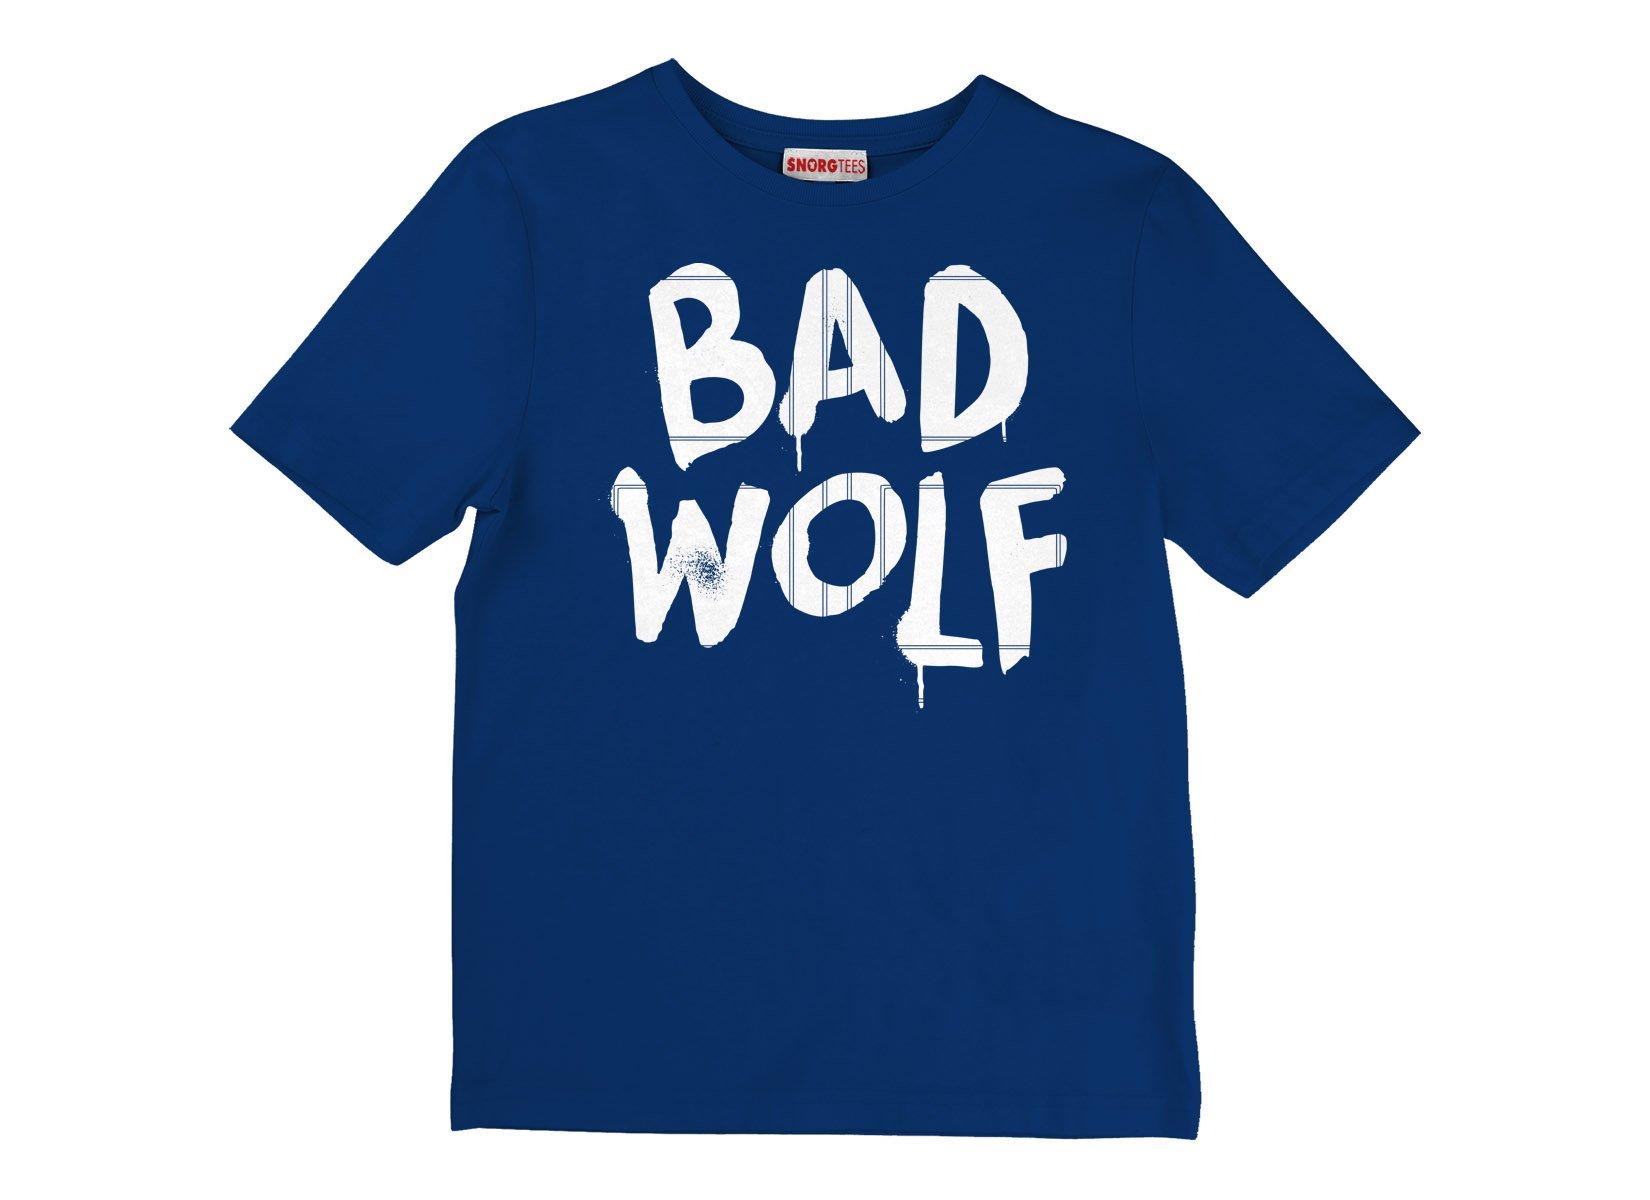 Bad Wolf on Kids T-Shirt